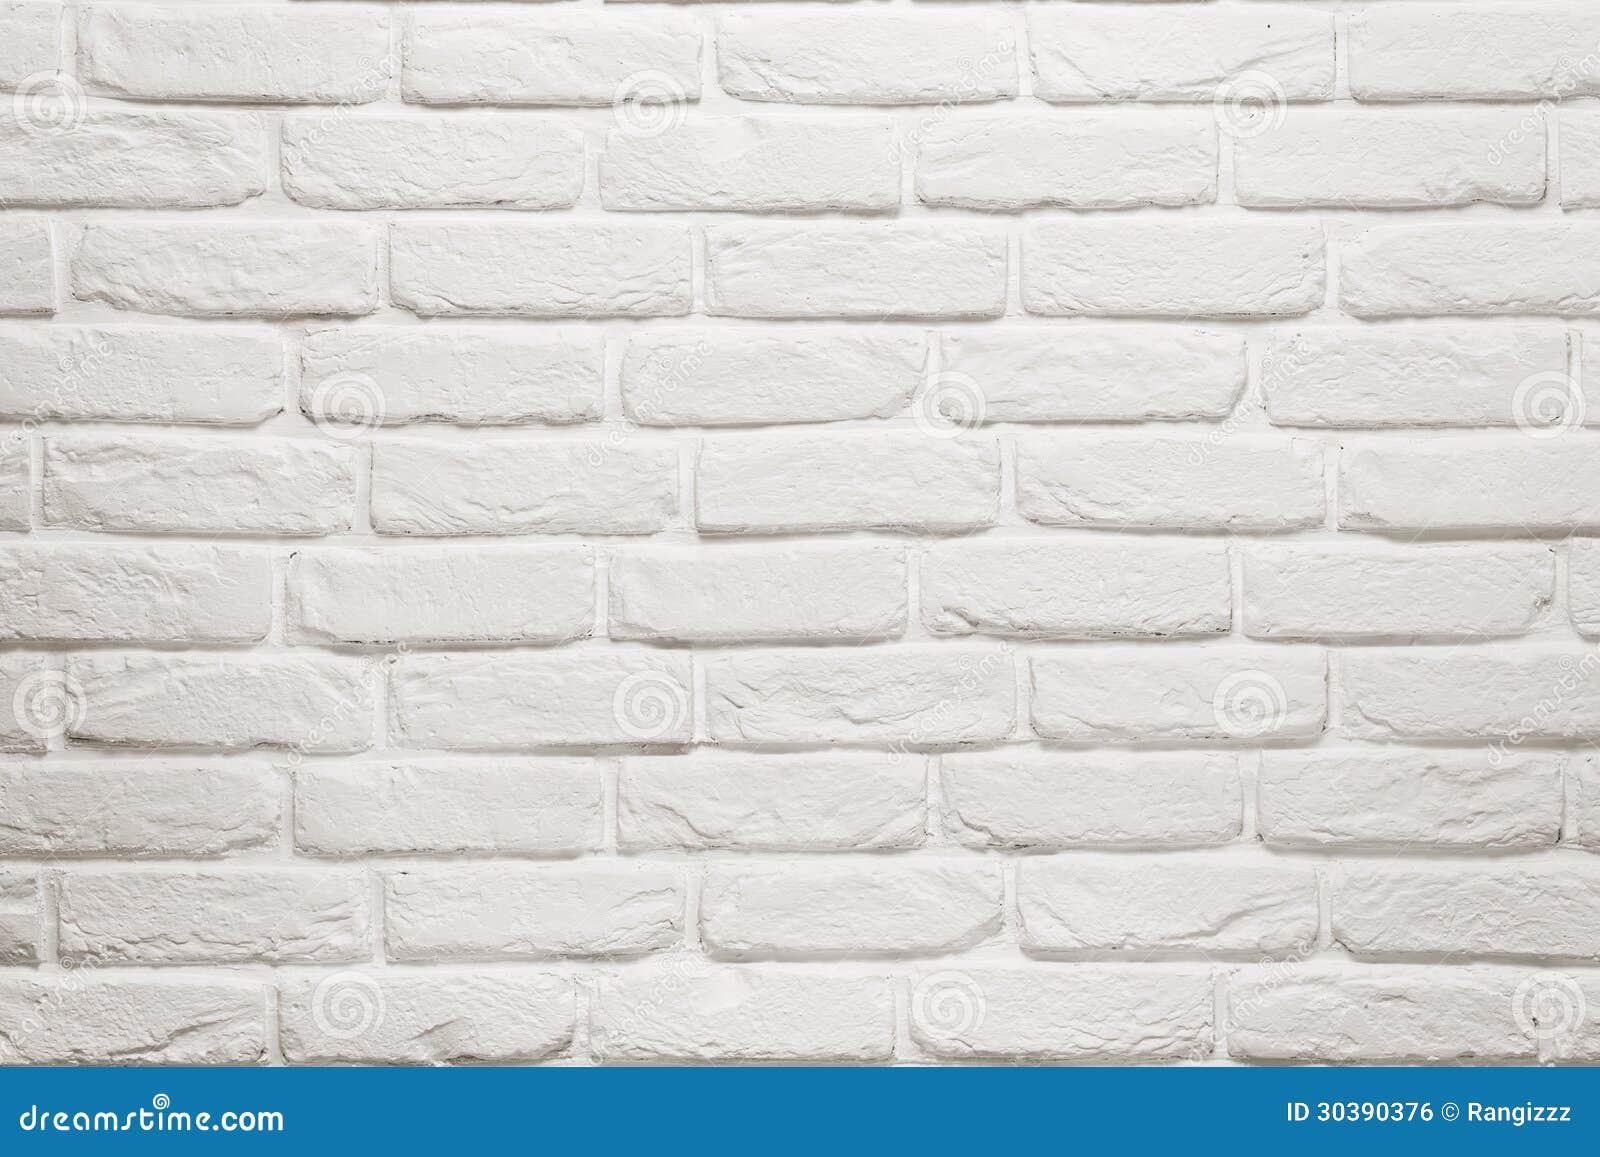 Empty White Brick Wall Royalty Free Stock Image Image